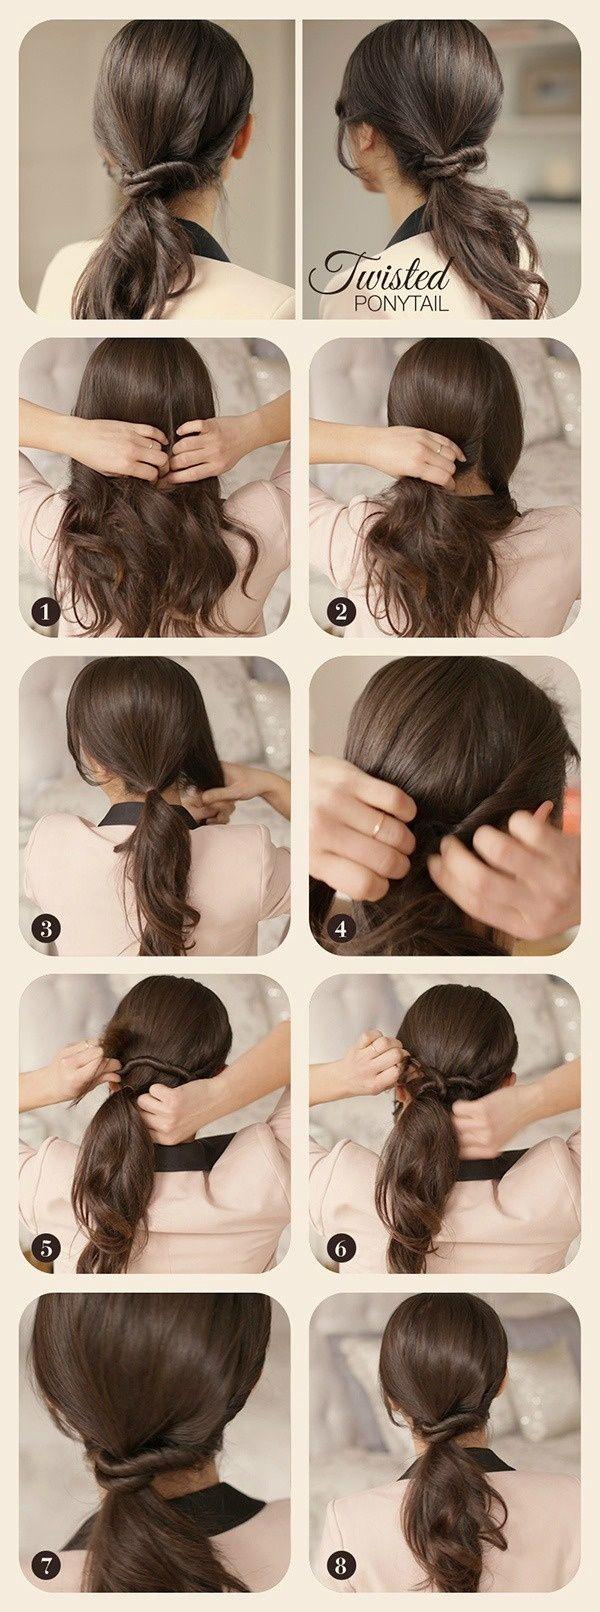 Beautiful hair tutorial easy hair style pinterest beautiful